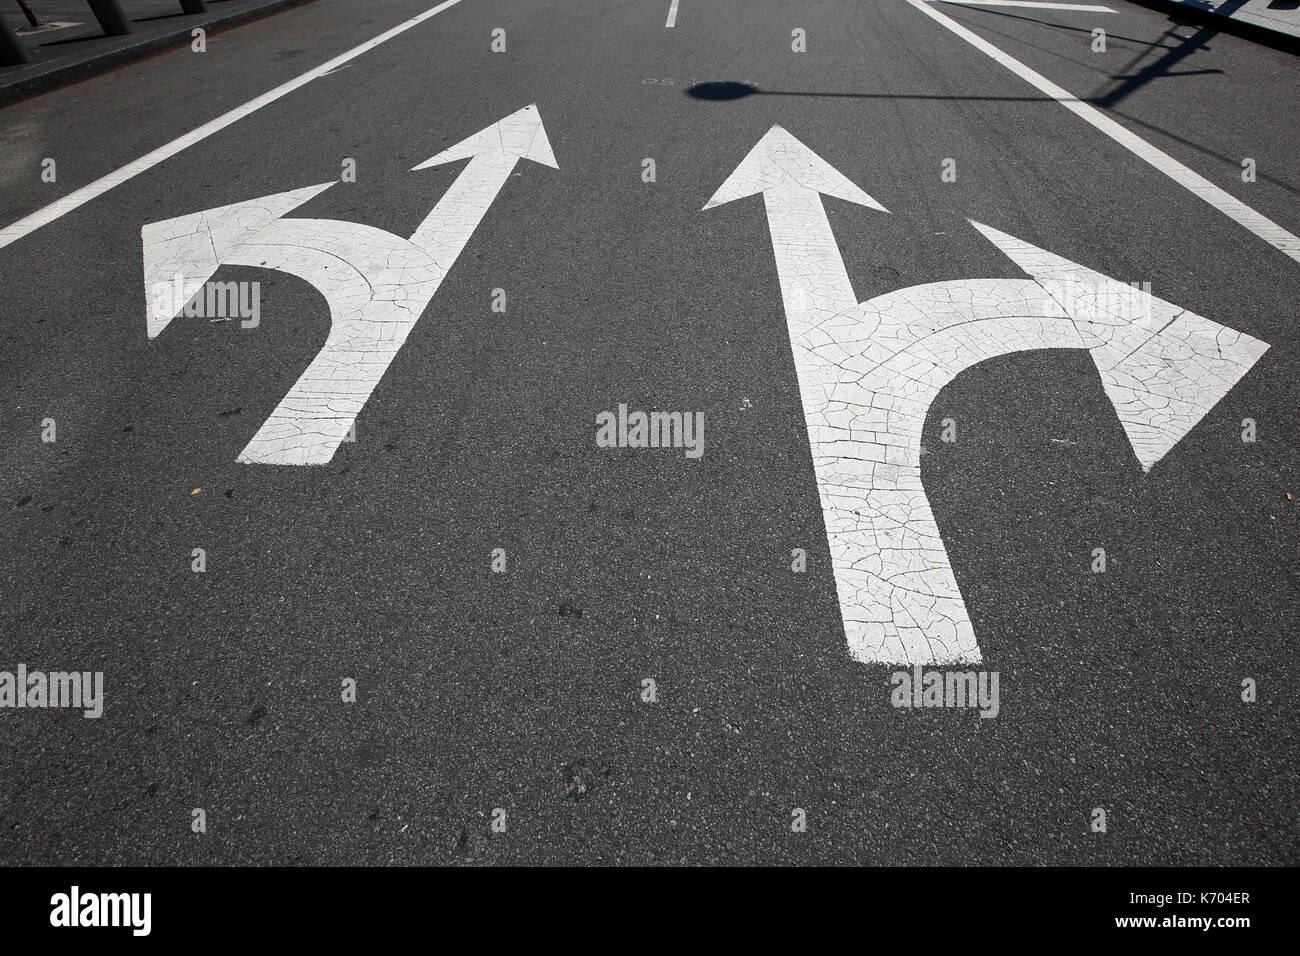 painted traffic signalization on street - Stock Image